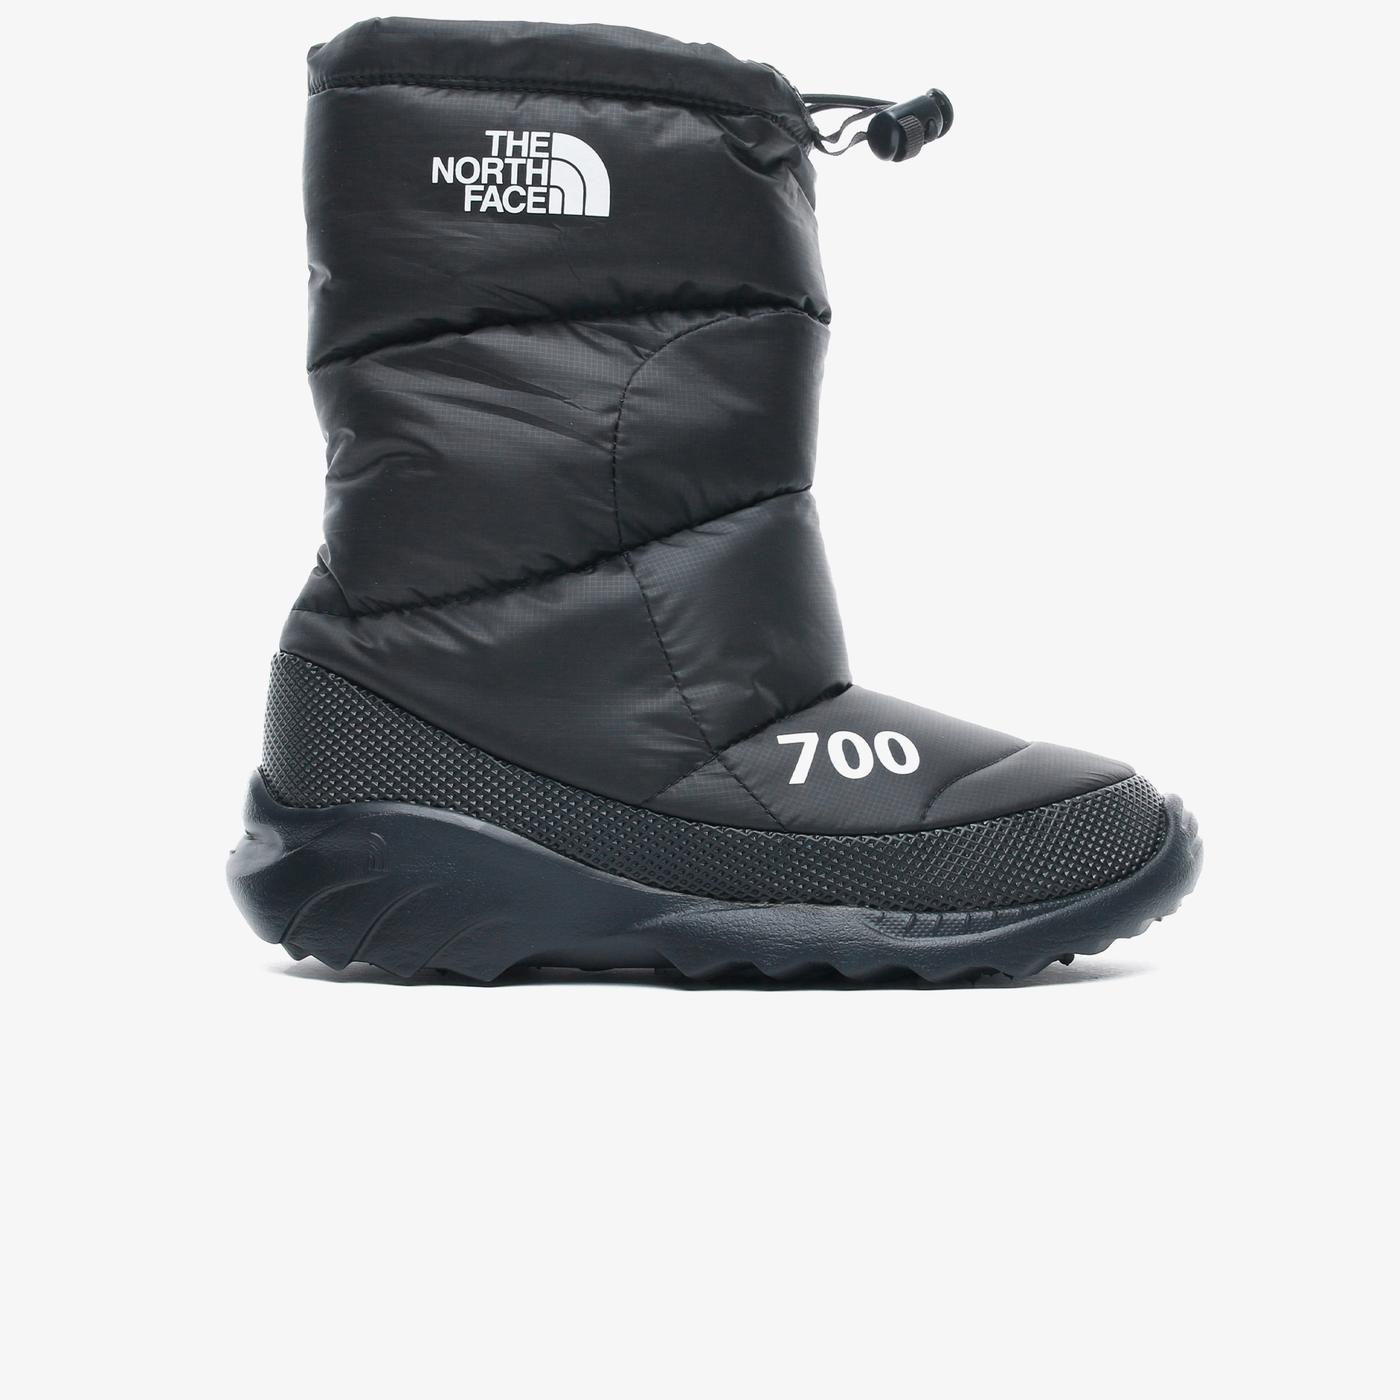 The North Face Nuptse Bootie 700 Kadın Siyah Bot